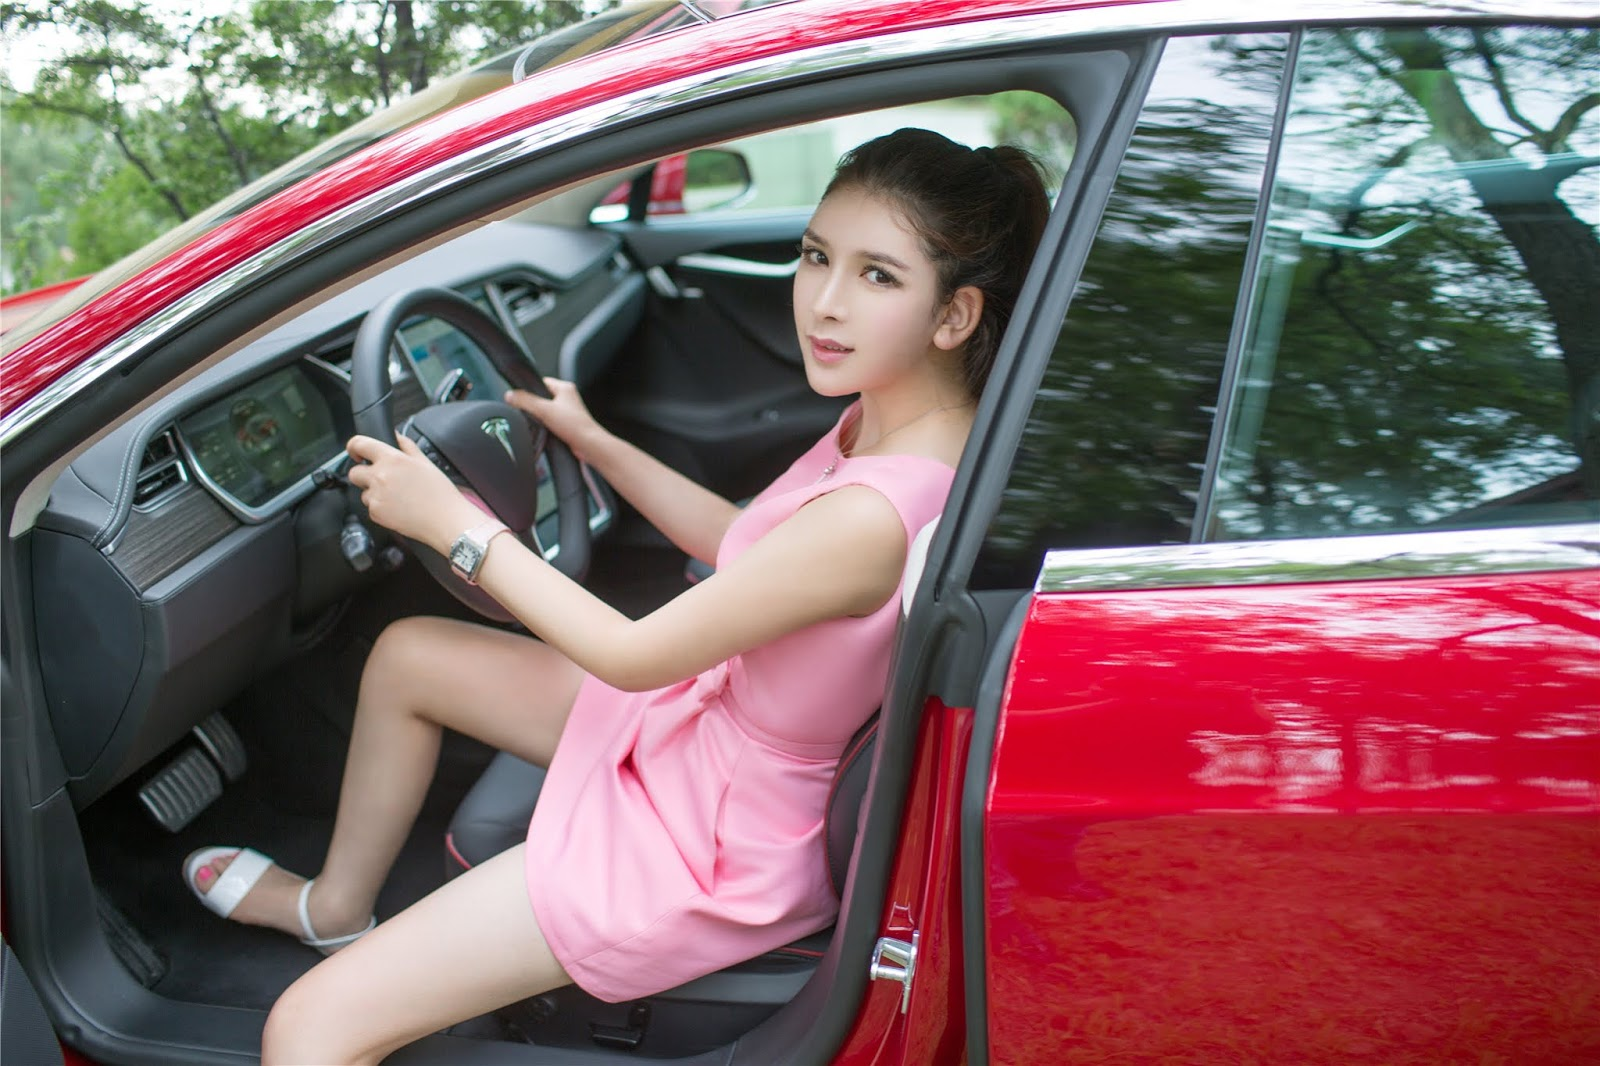 BoolWowGirls%2B%252836%2529 - Li LiSha 李丽莎 Beautiful Nude Model